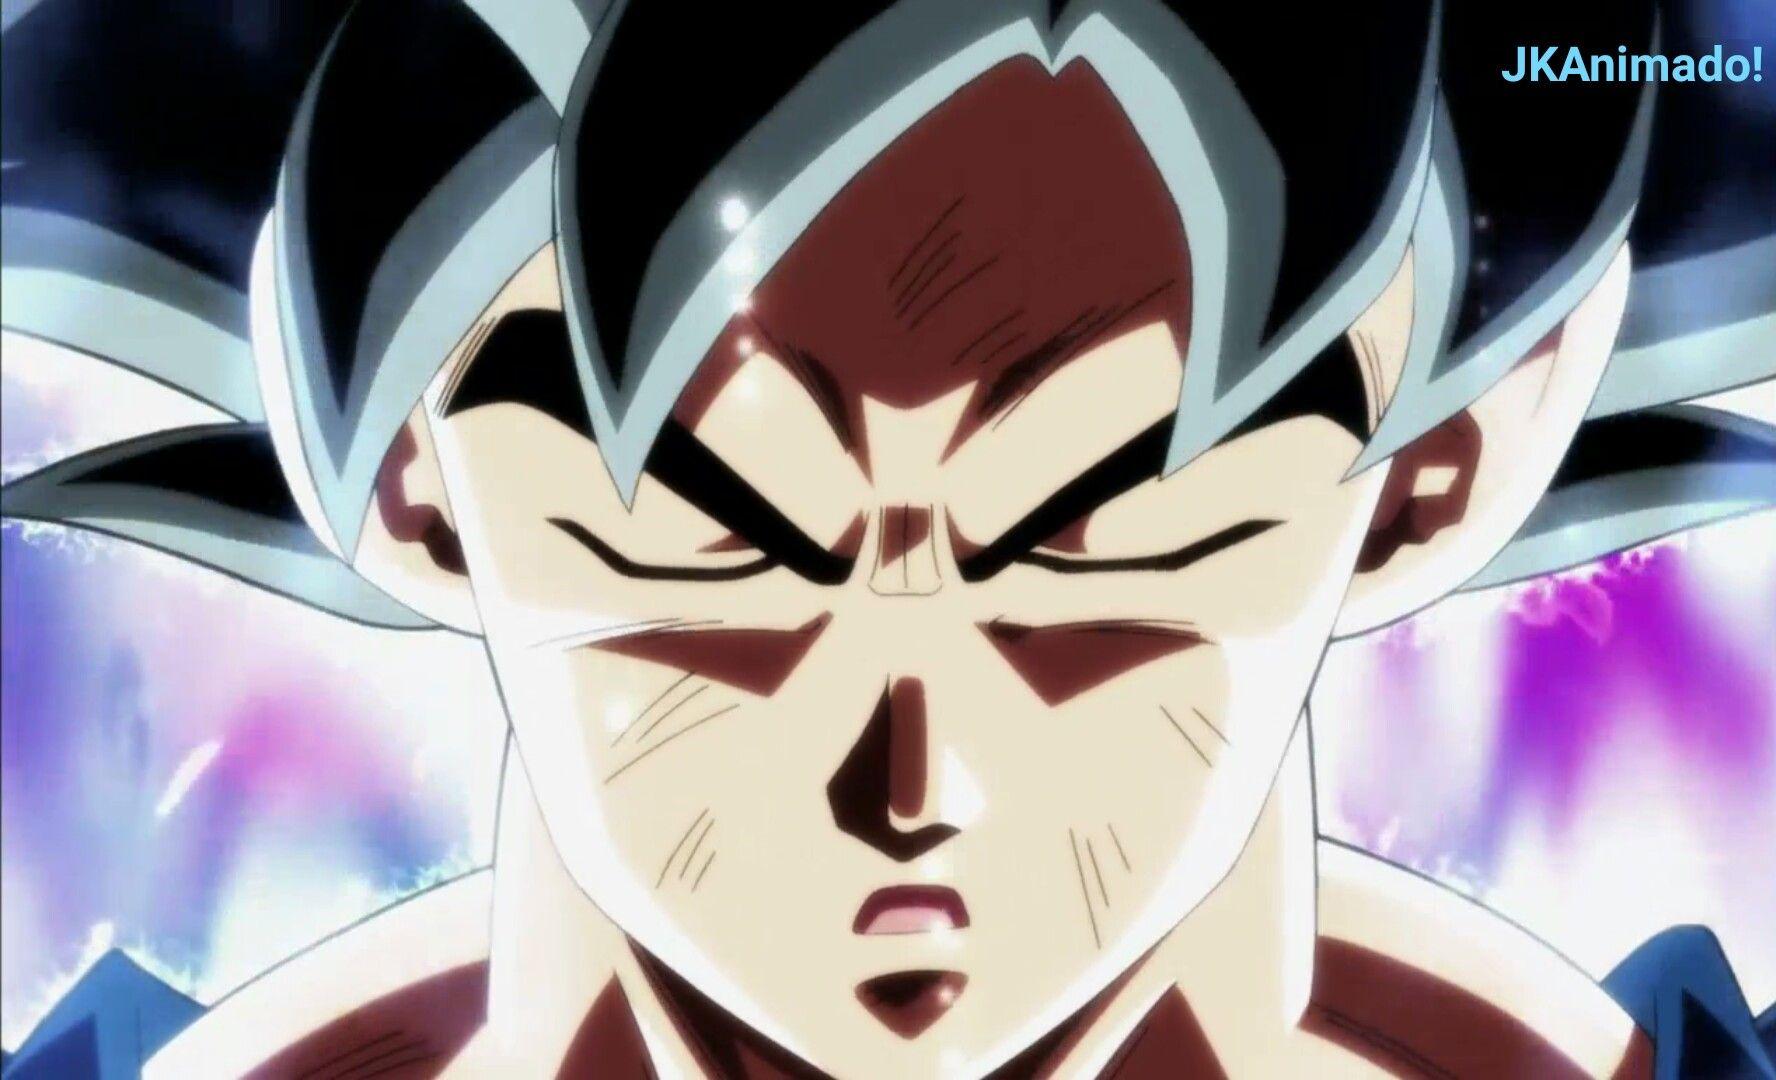 Goku Vs Jiren Roblox Pin By Madison Fitzgerald On Migatte No Gokui Dragon Ball Super Manga Anime Dragon Ball Dragon Ball Super Goku